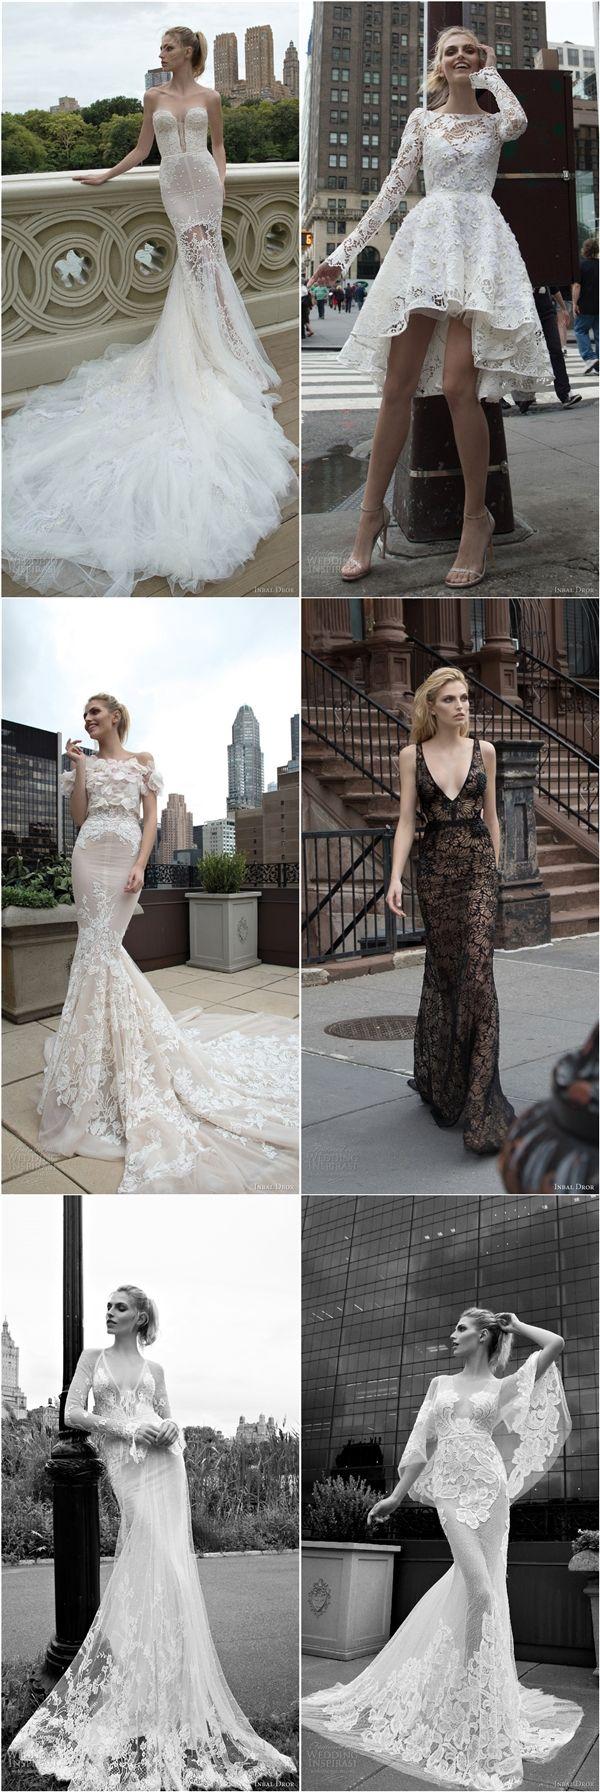 Inbal Dror Fall Wedding Dresses 2016 / http://www.deerpearlflowers.com/inbal-dror-fall-wedding-dresses-2016-new-york-colletion/2/